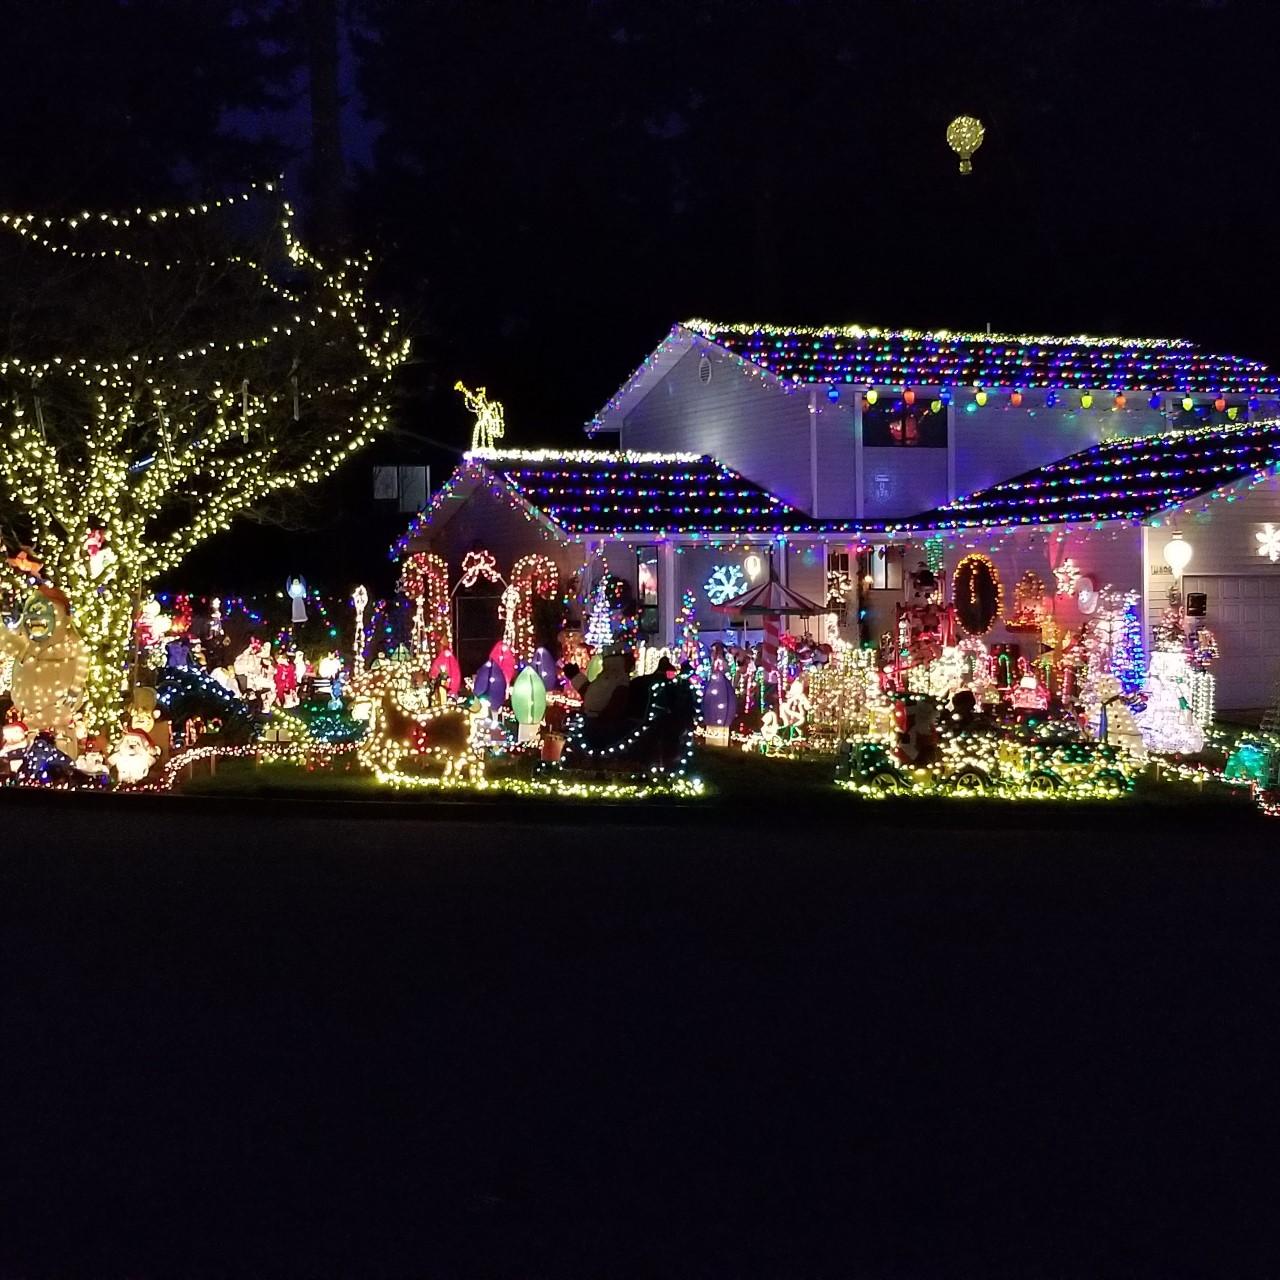 Colombian Vancouver Wa Christmas Lights 2020 Where to Find Christmas Lights in Vancouver and Surrounding Areas